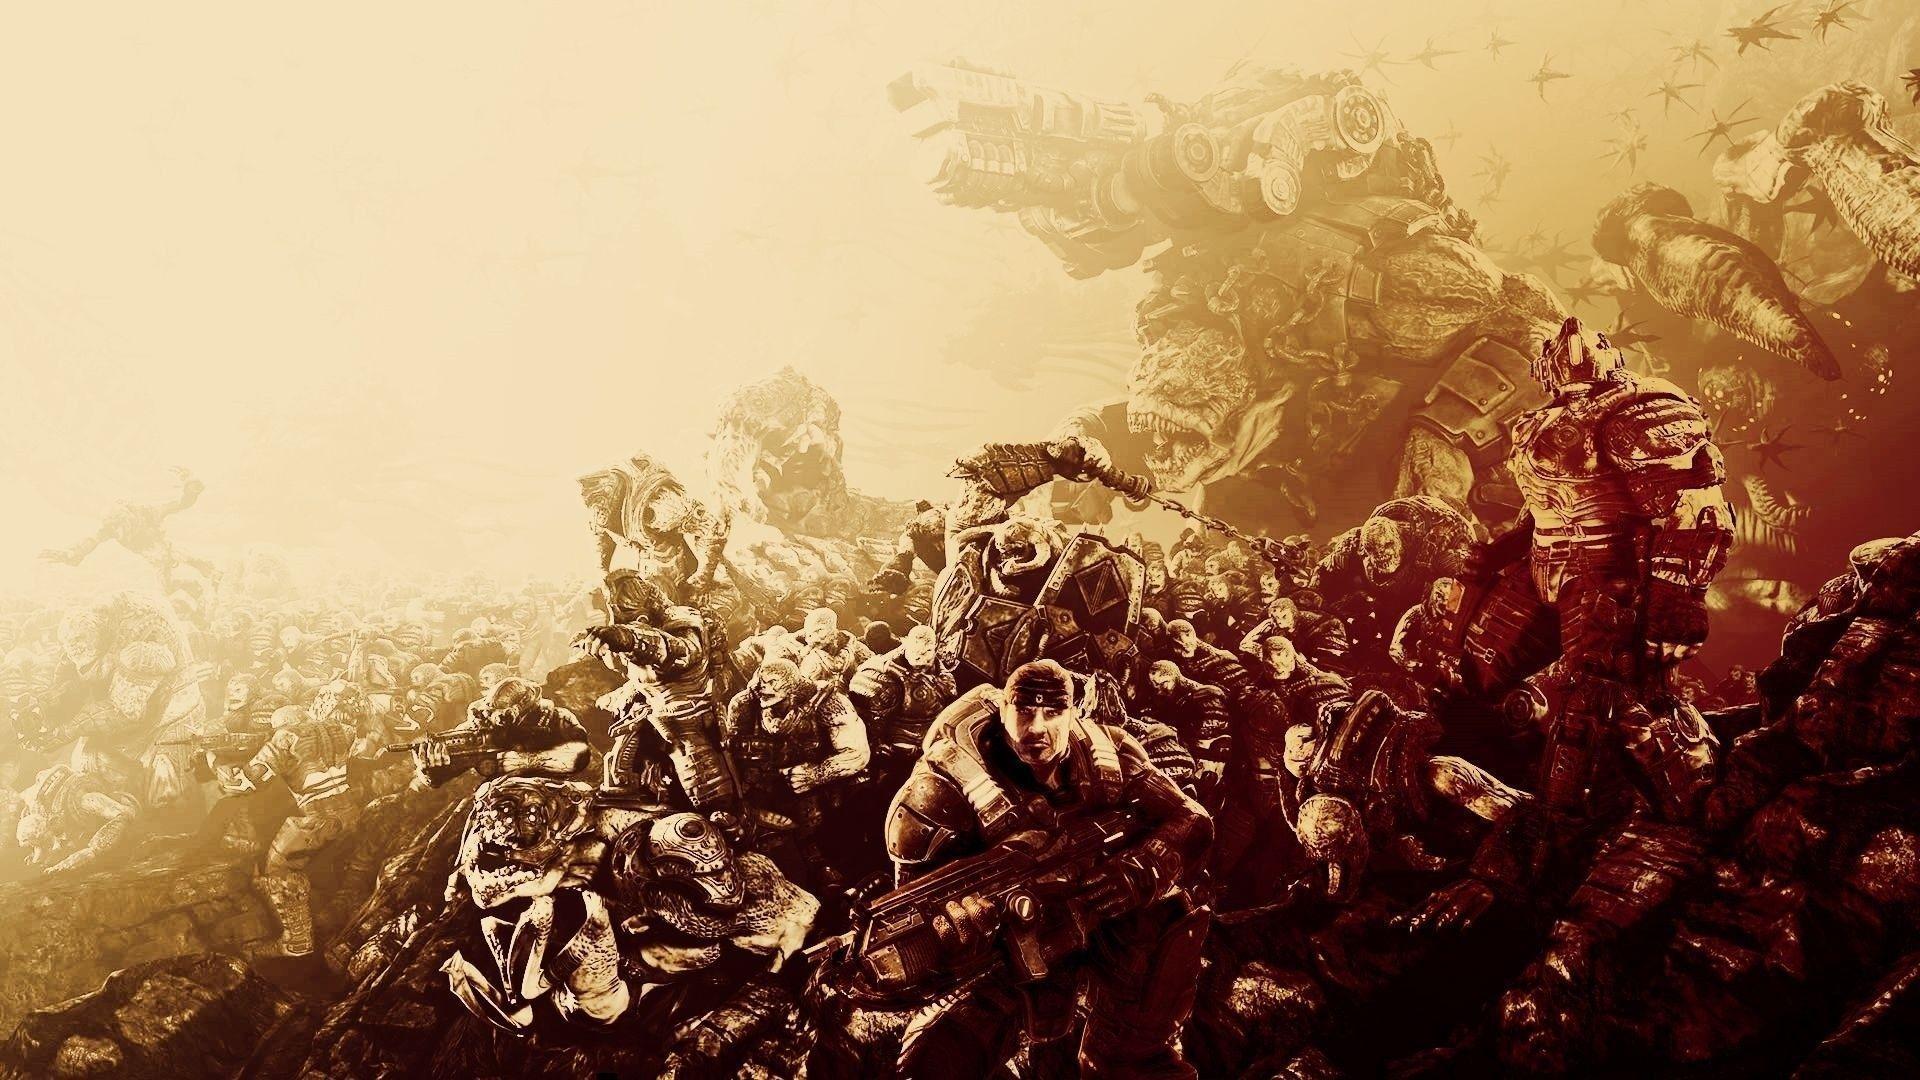 Download Gears Of War Logo Wallpaper Hd Backgrounds Download